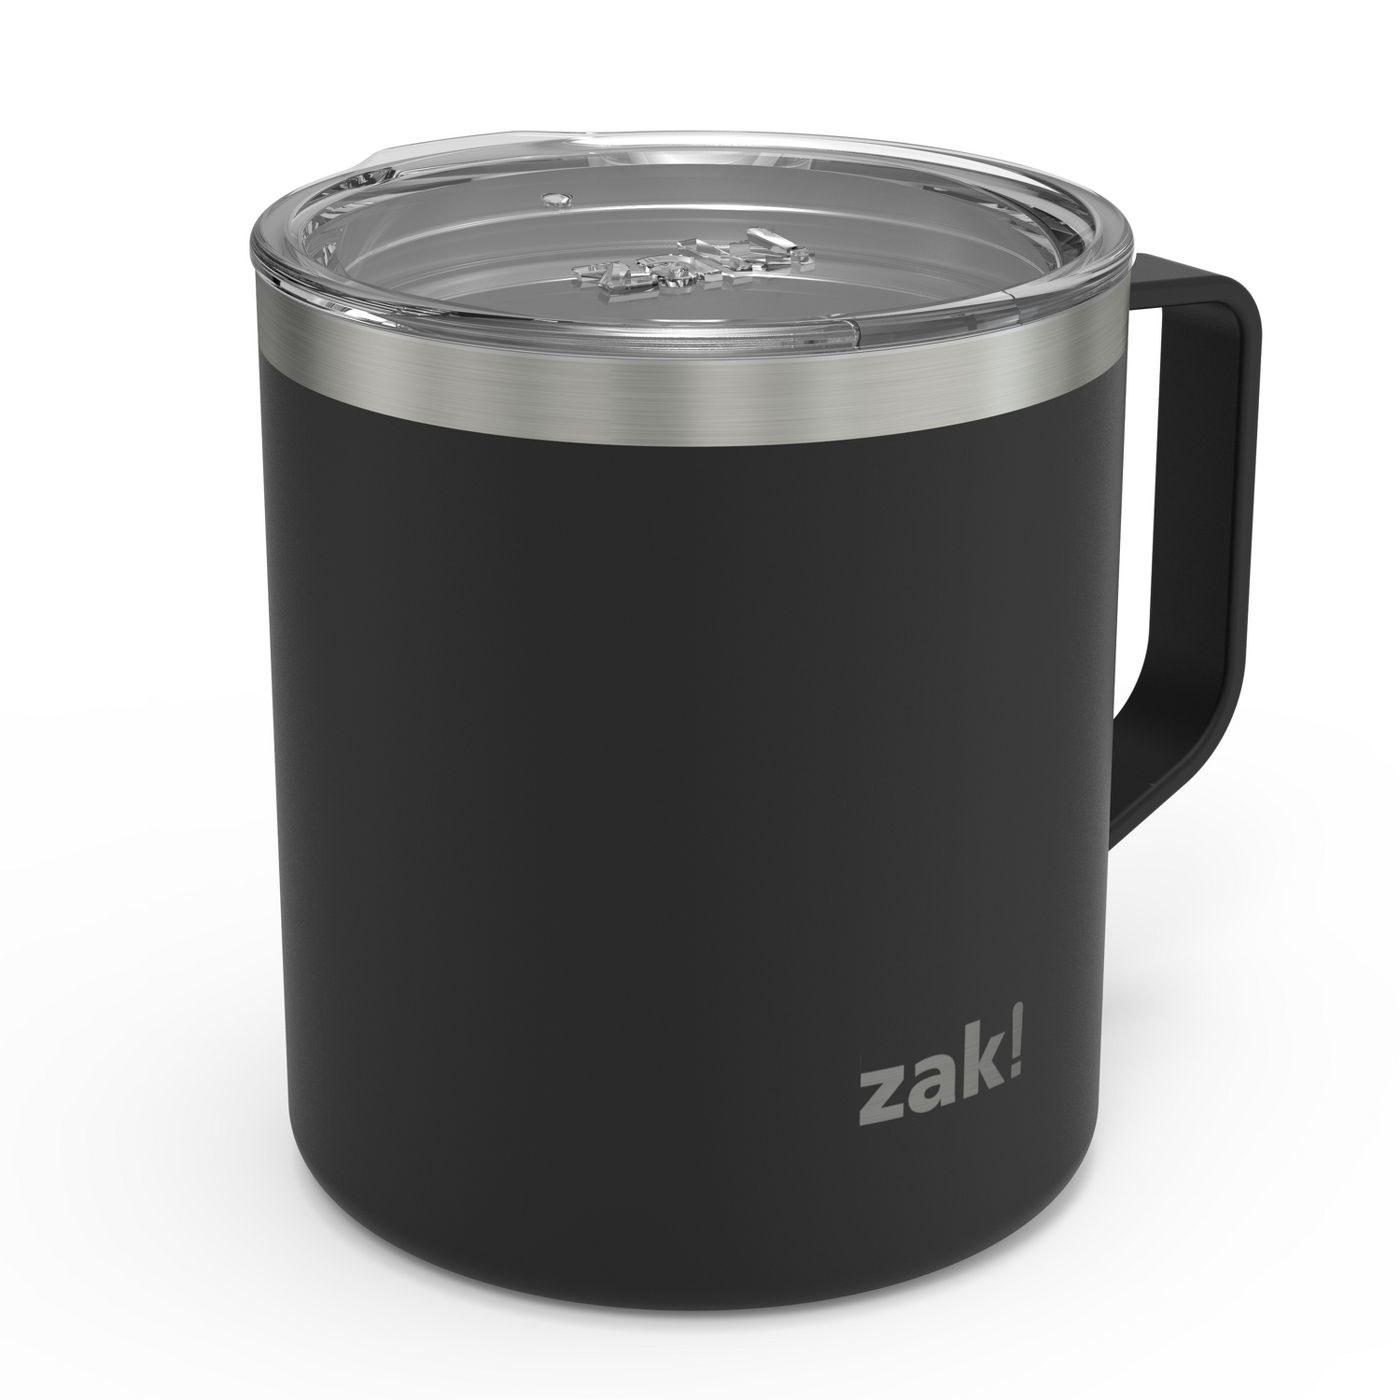 a black insulated mug